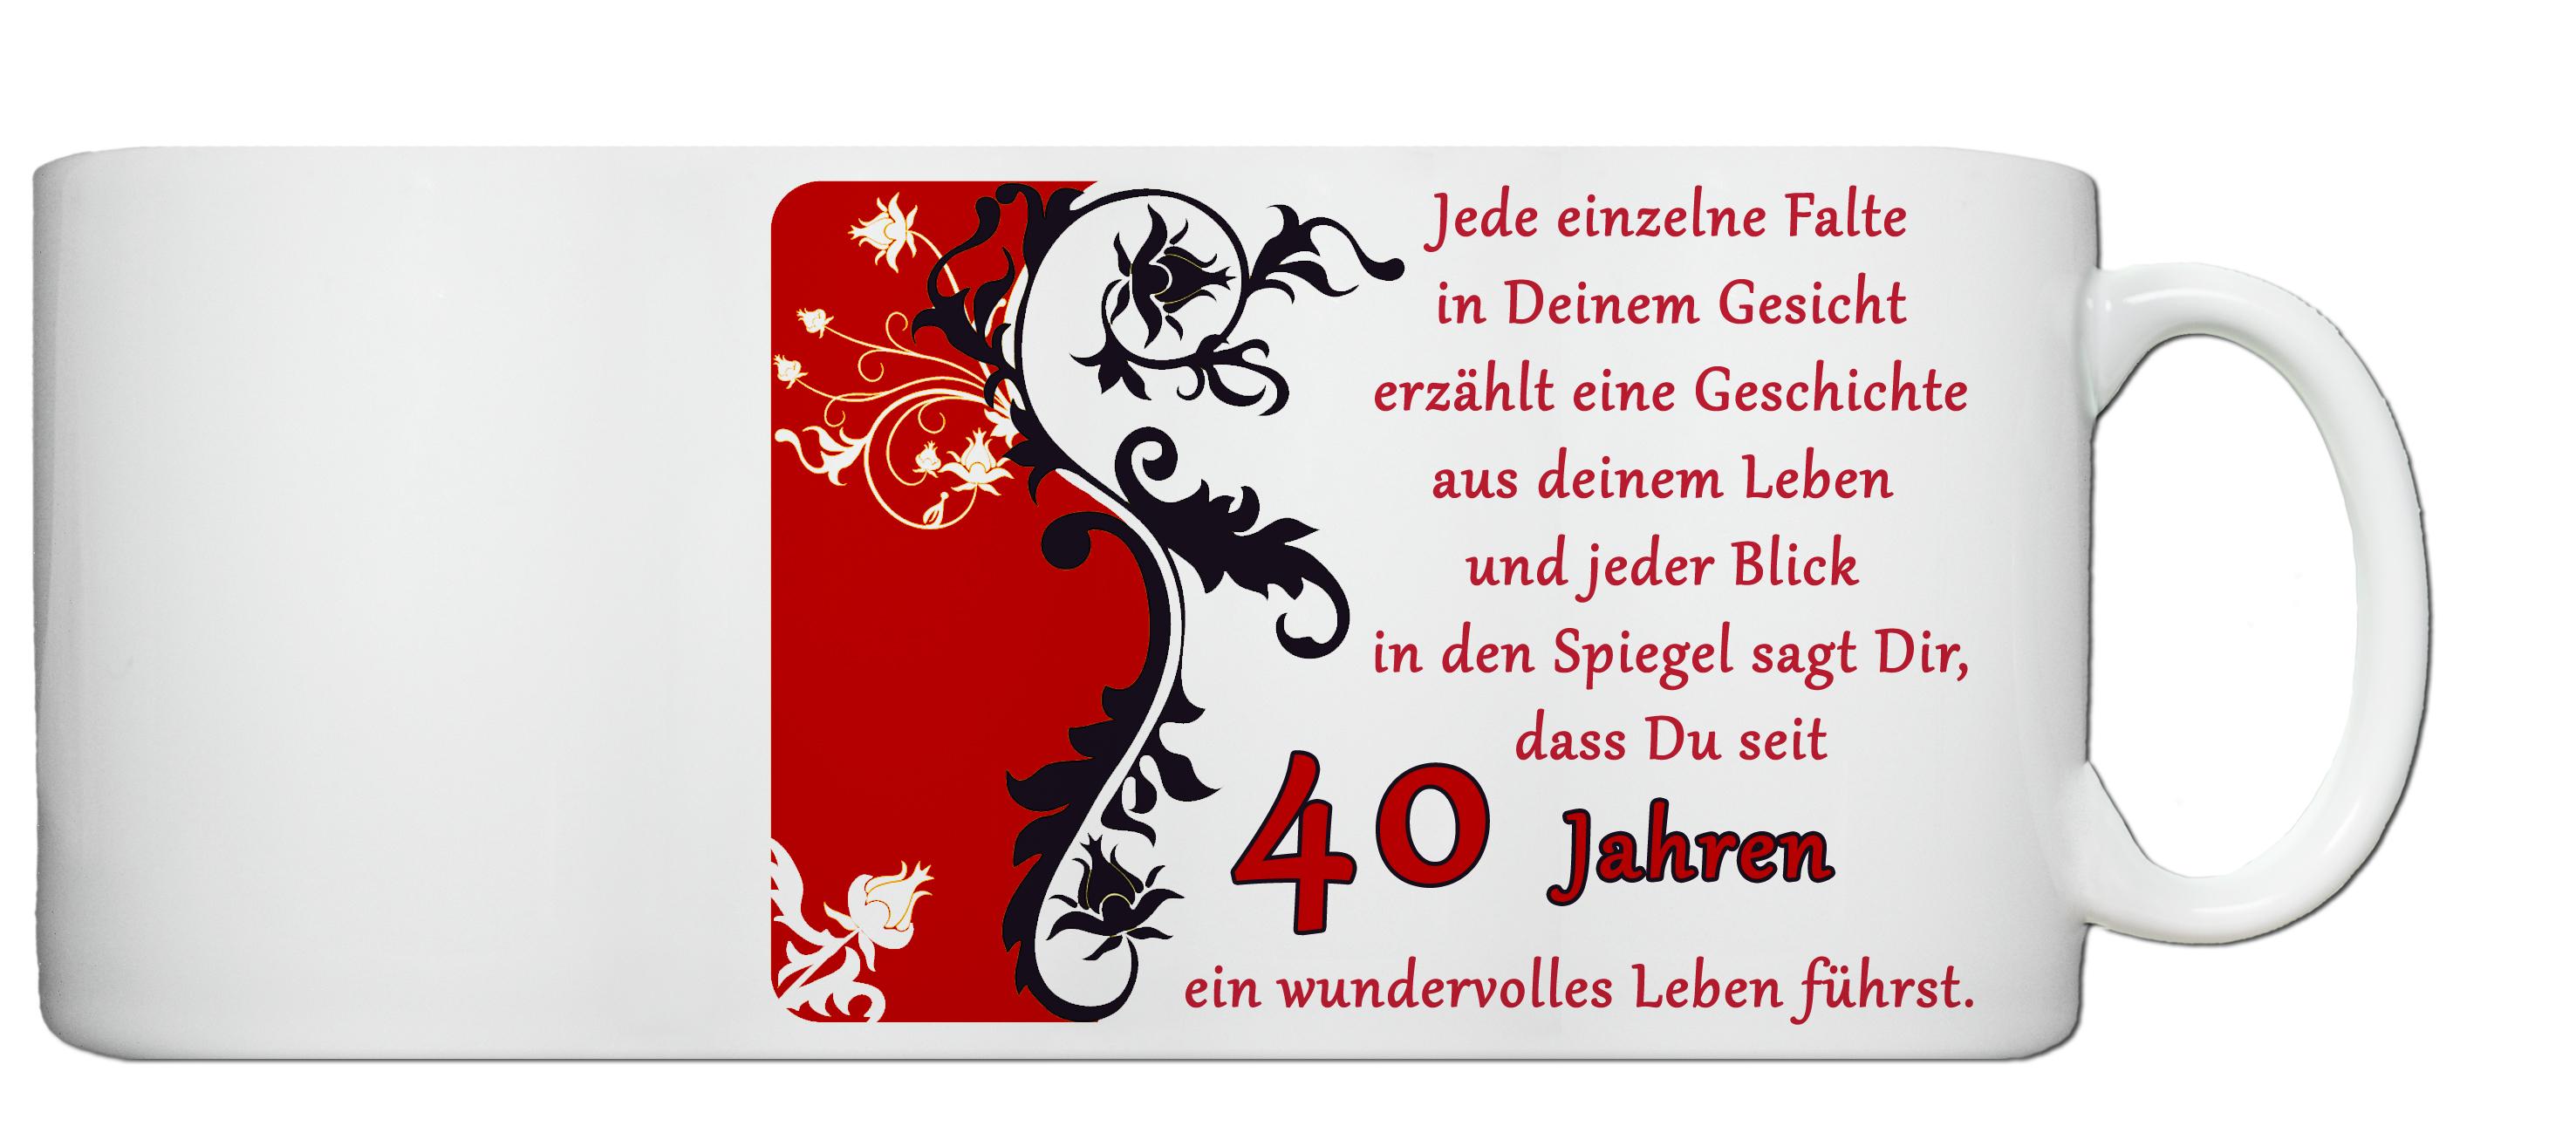 Geburtstagsgrüße Zum 40. Geburtstag